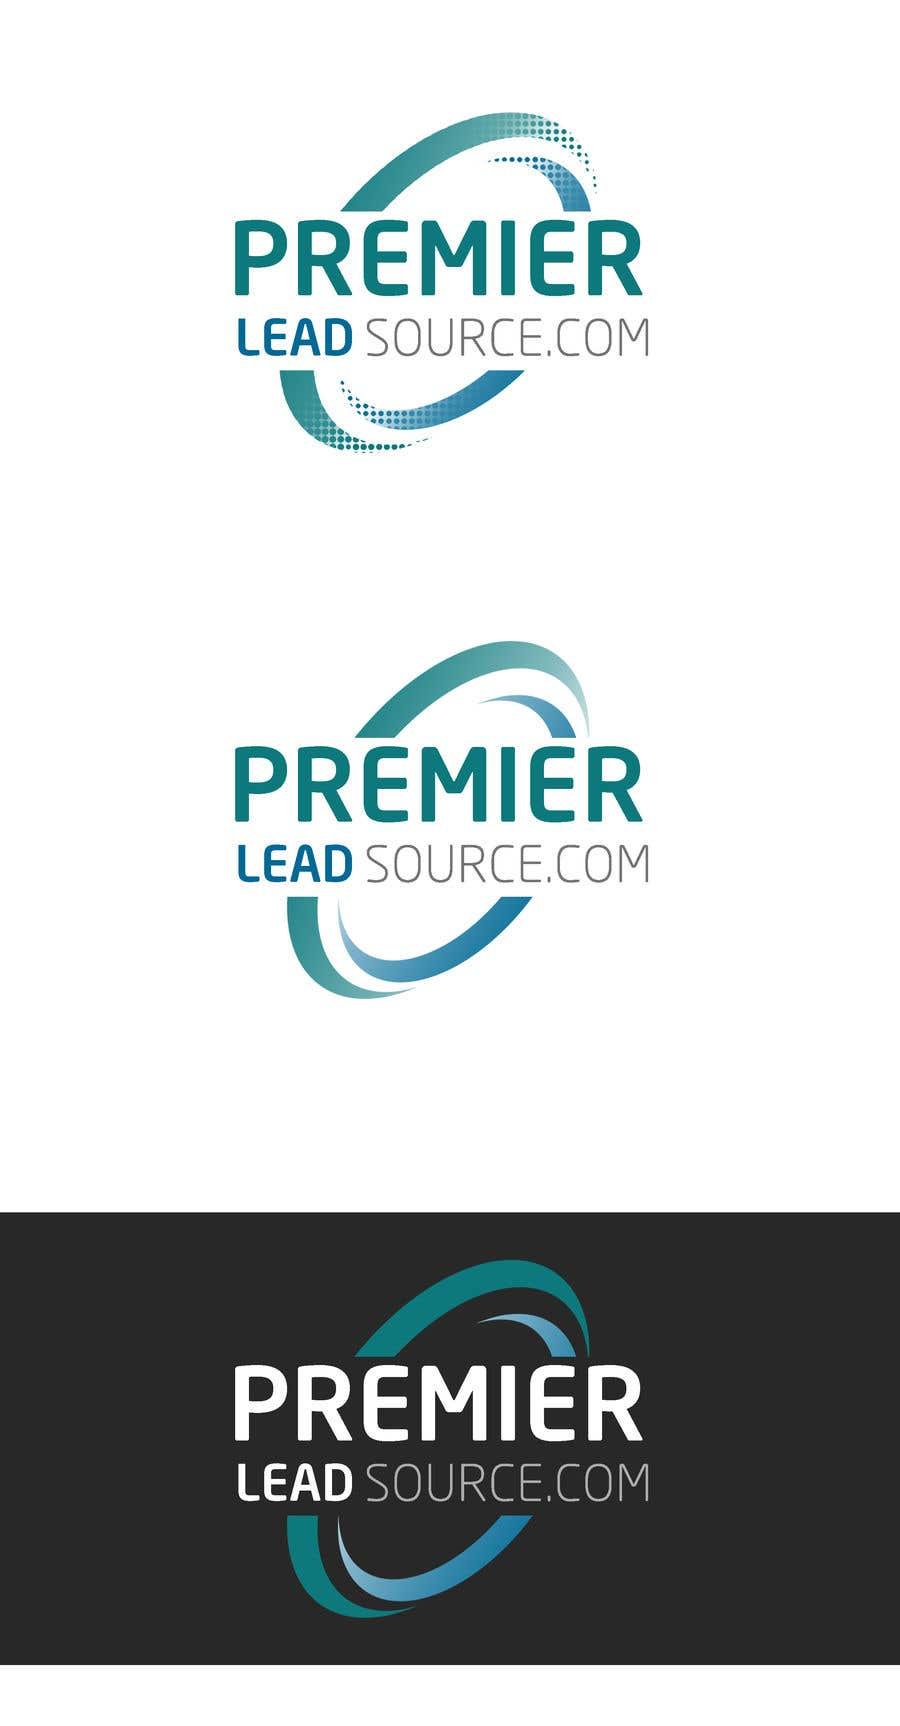 Contest Entry #                                        93                                      for                                         Logo for Premier Lead Source.com